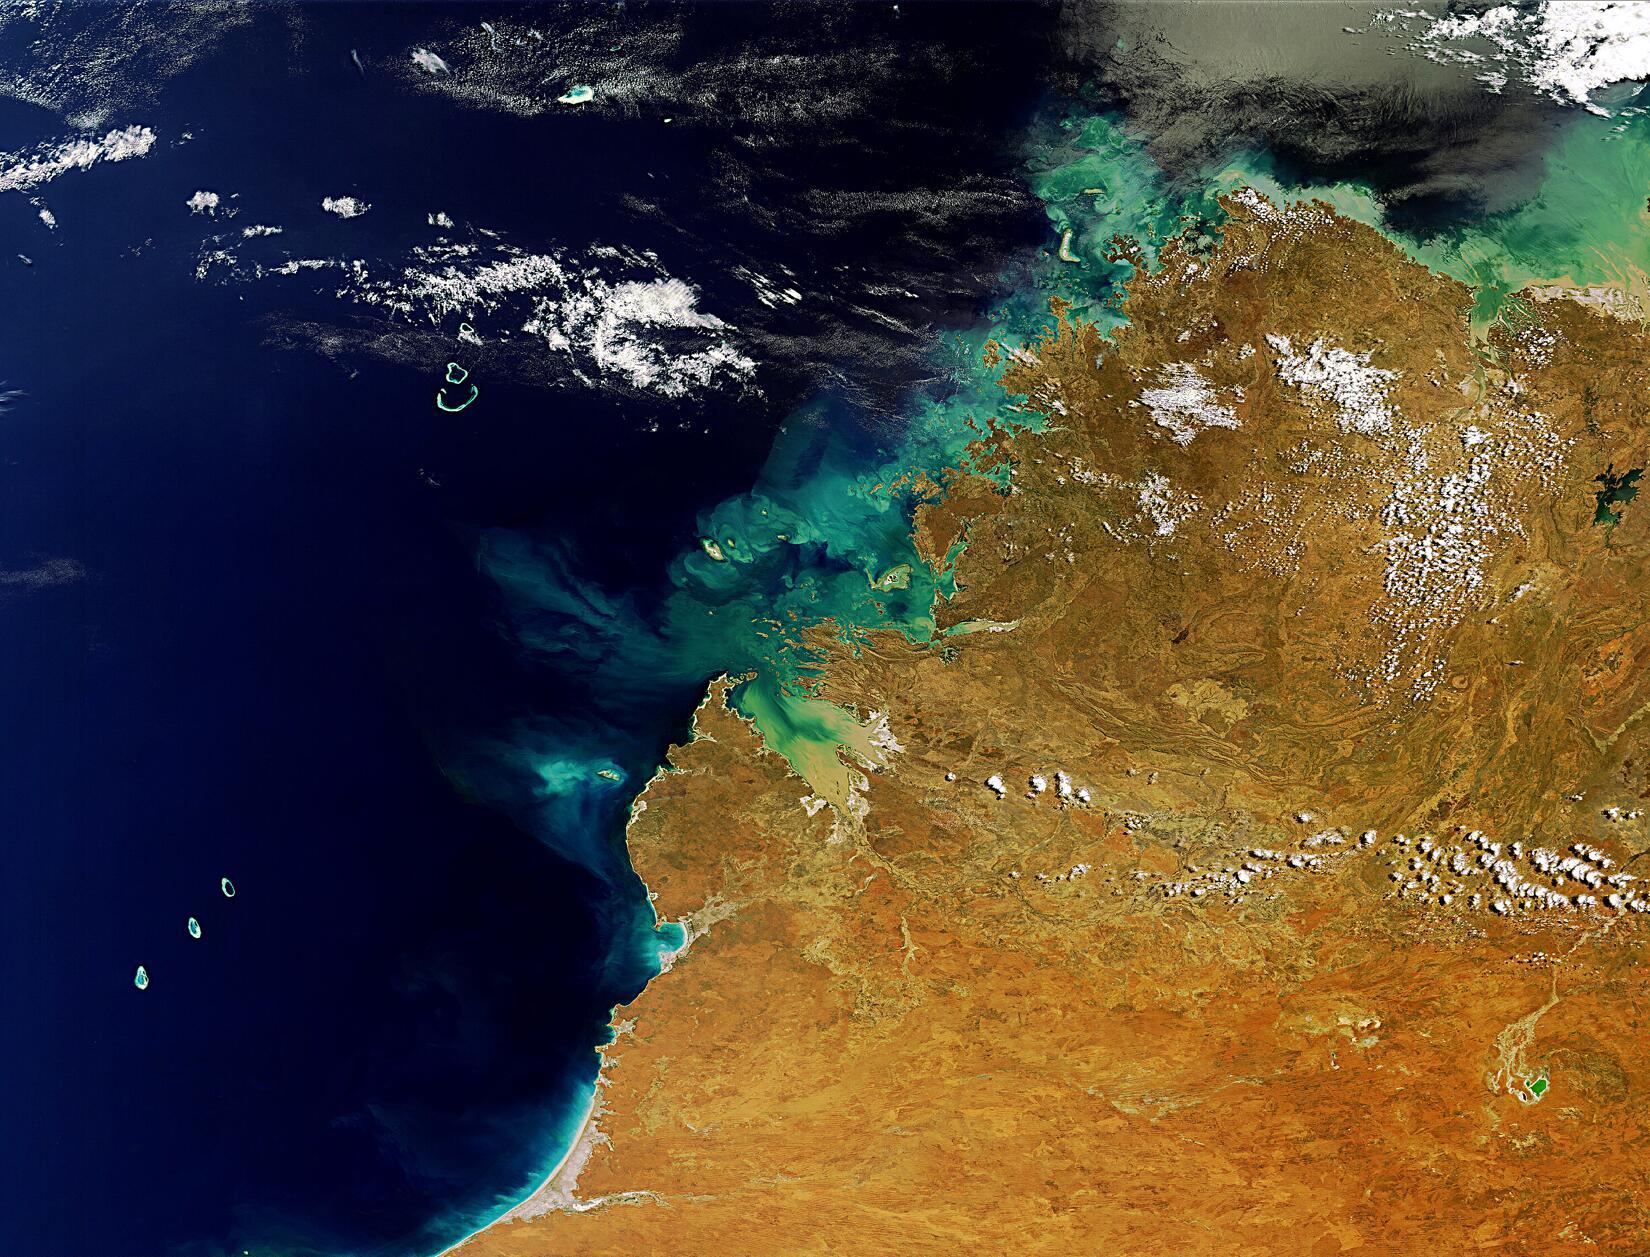 Bild zu Nordwest-australischer Bundesstaat Kimberley